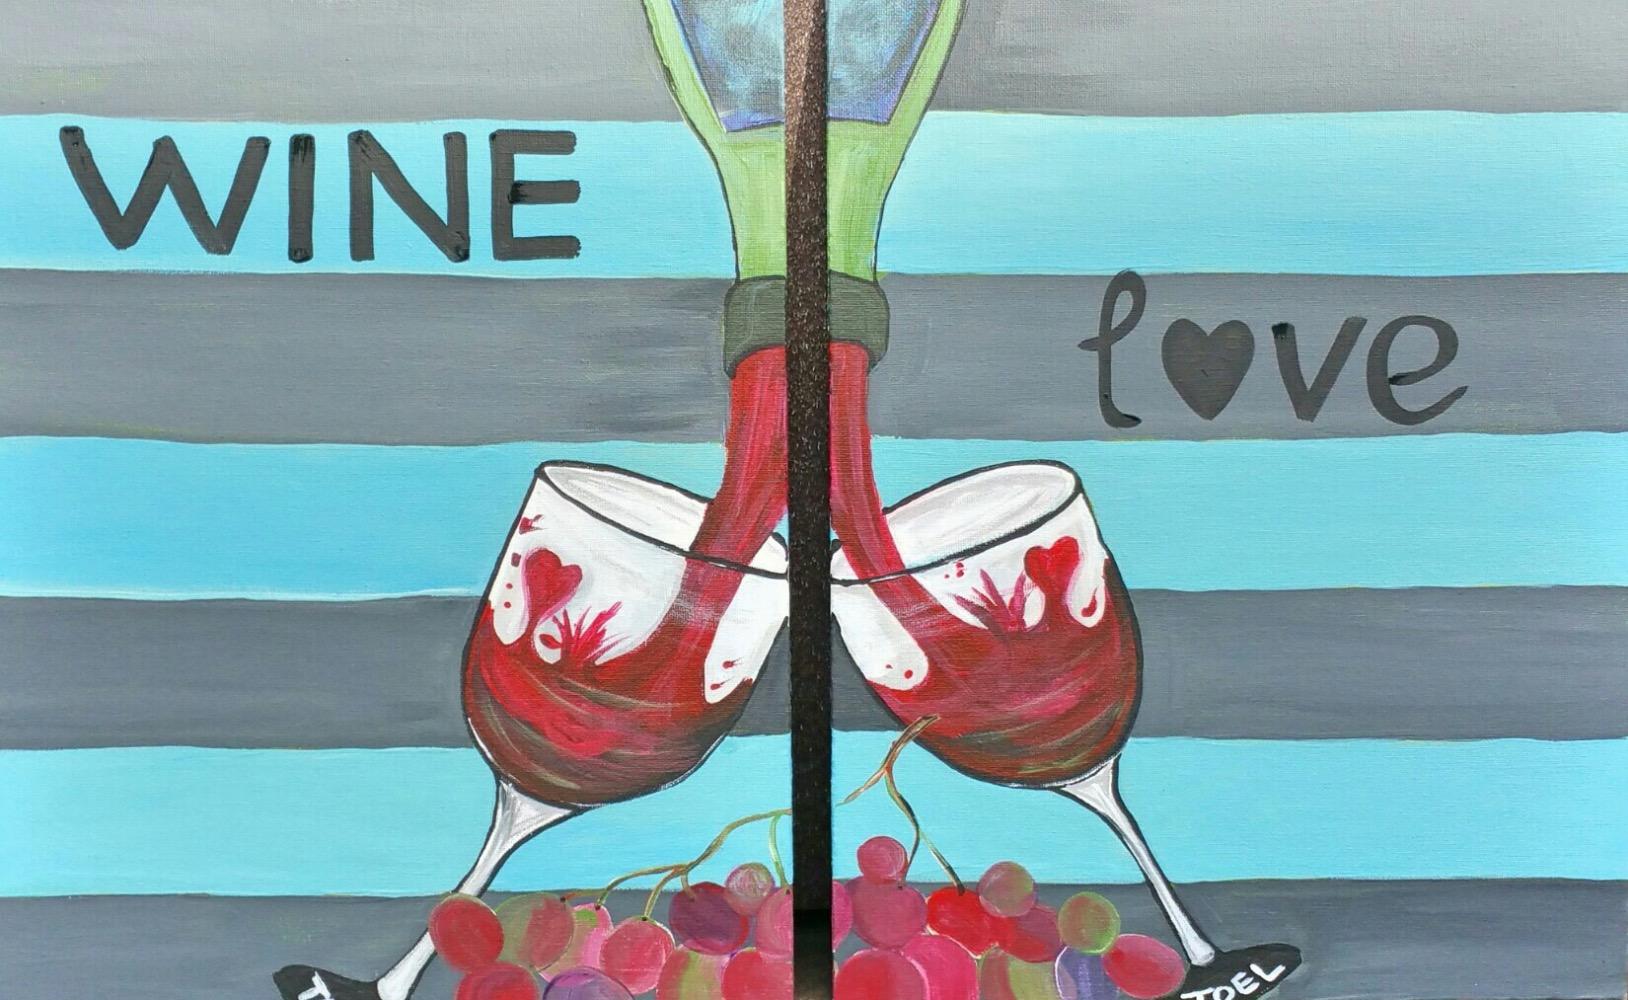 Wine Love combined